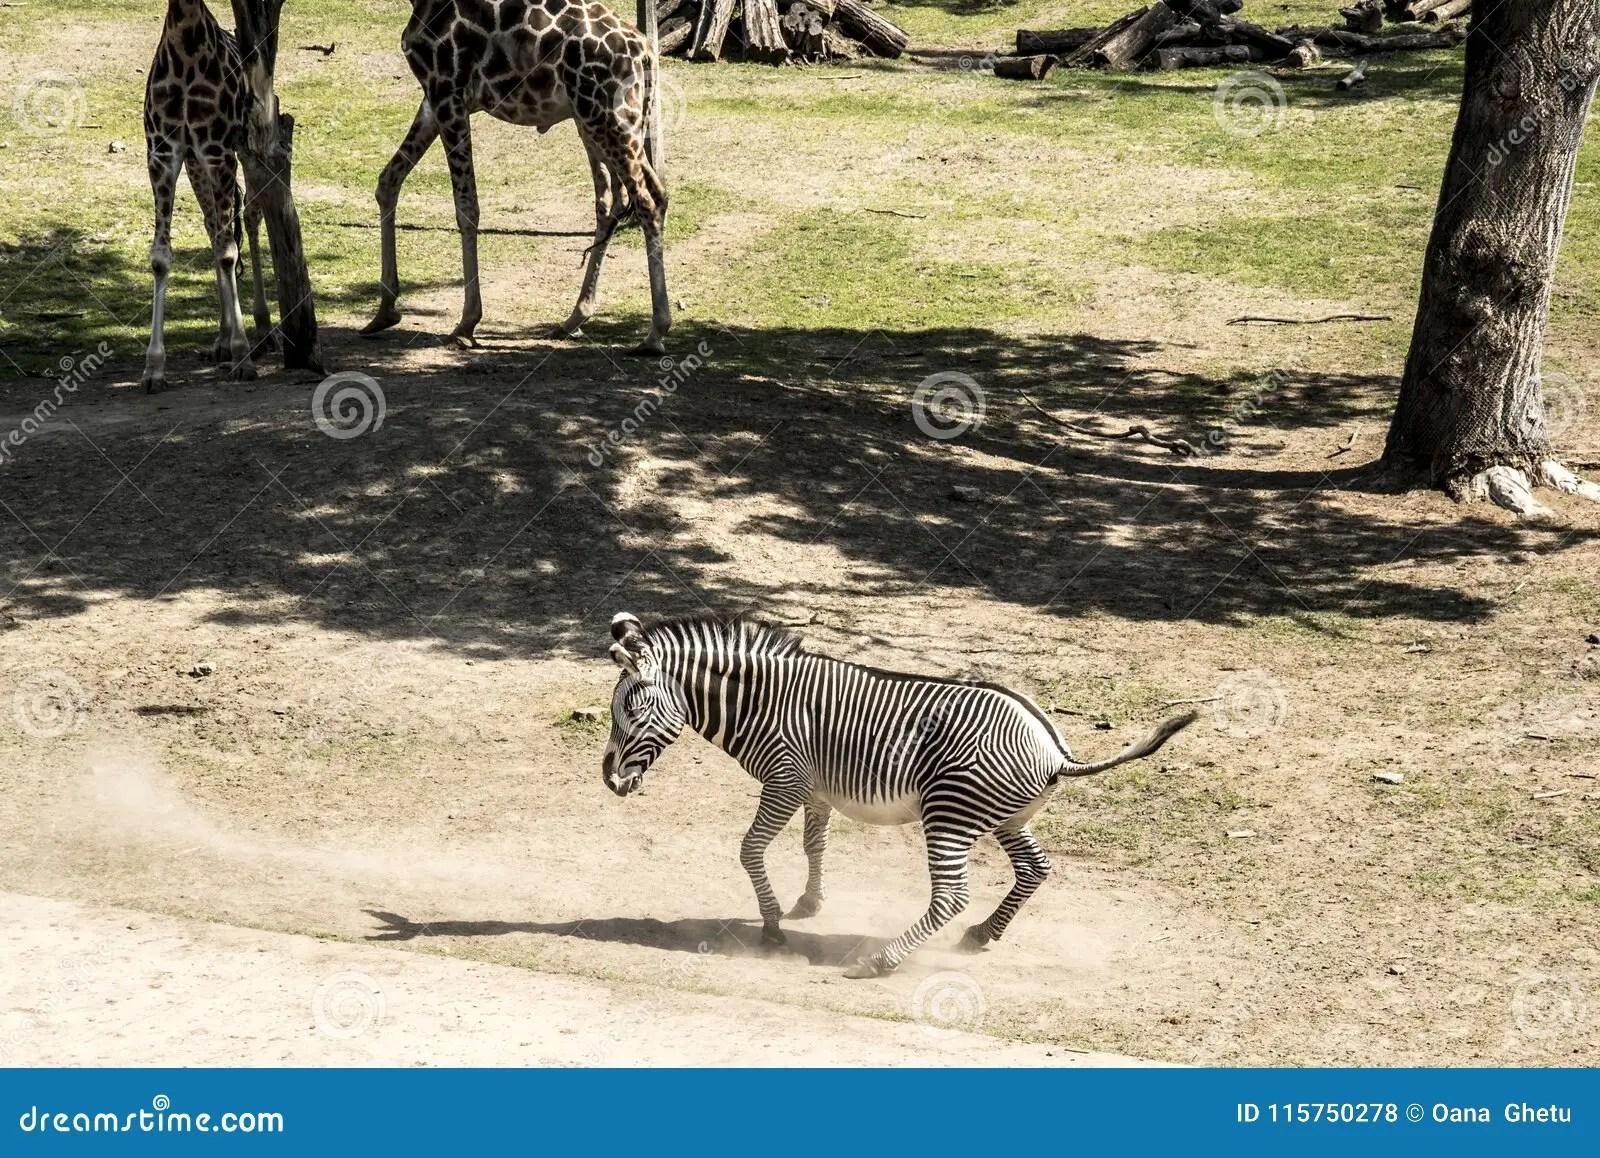 Zebra And Giraffes Stock Photo Image Of Green Horse